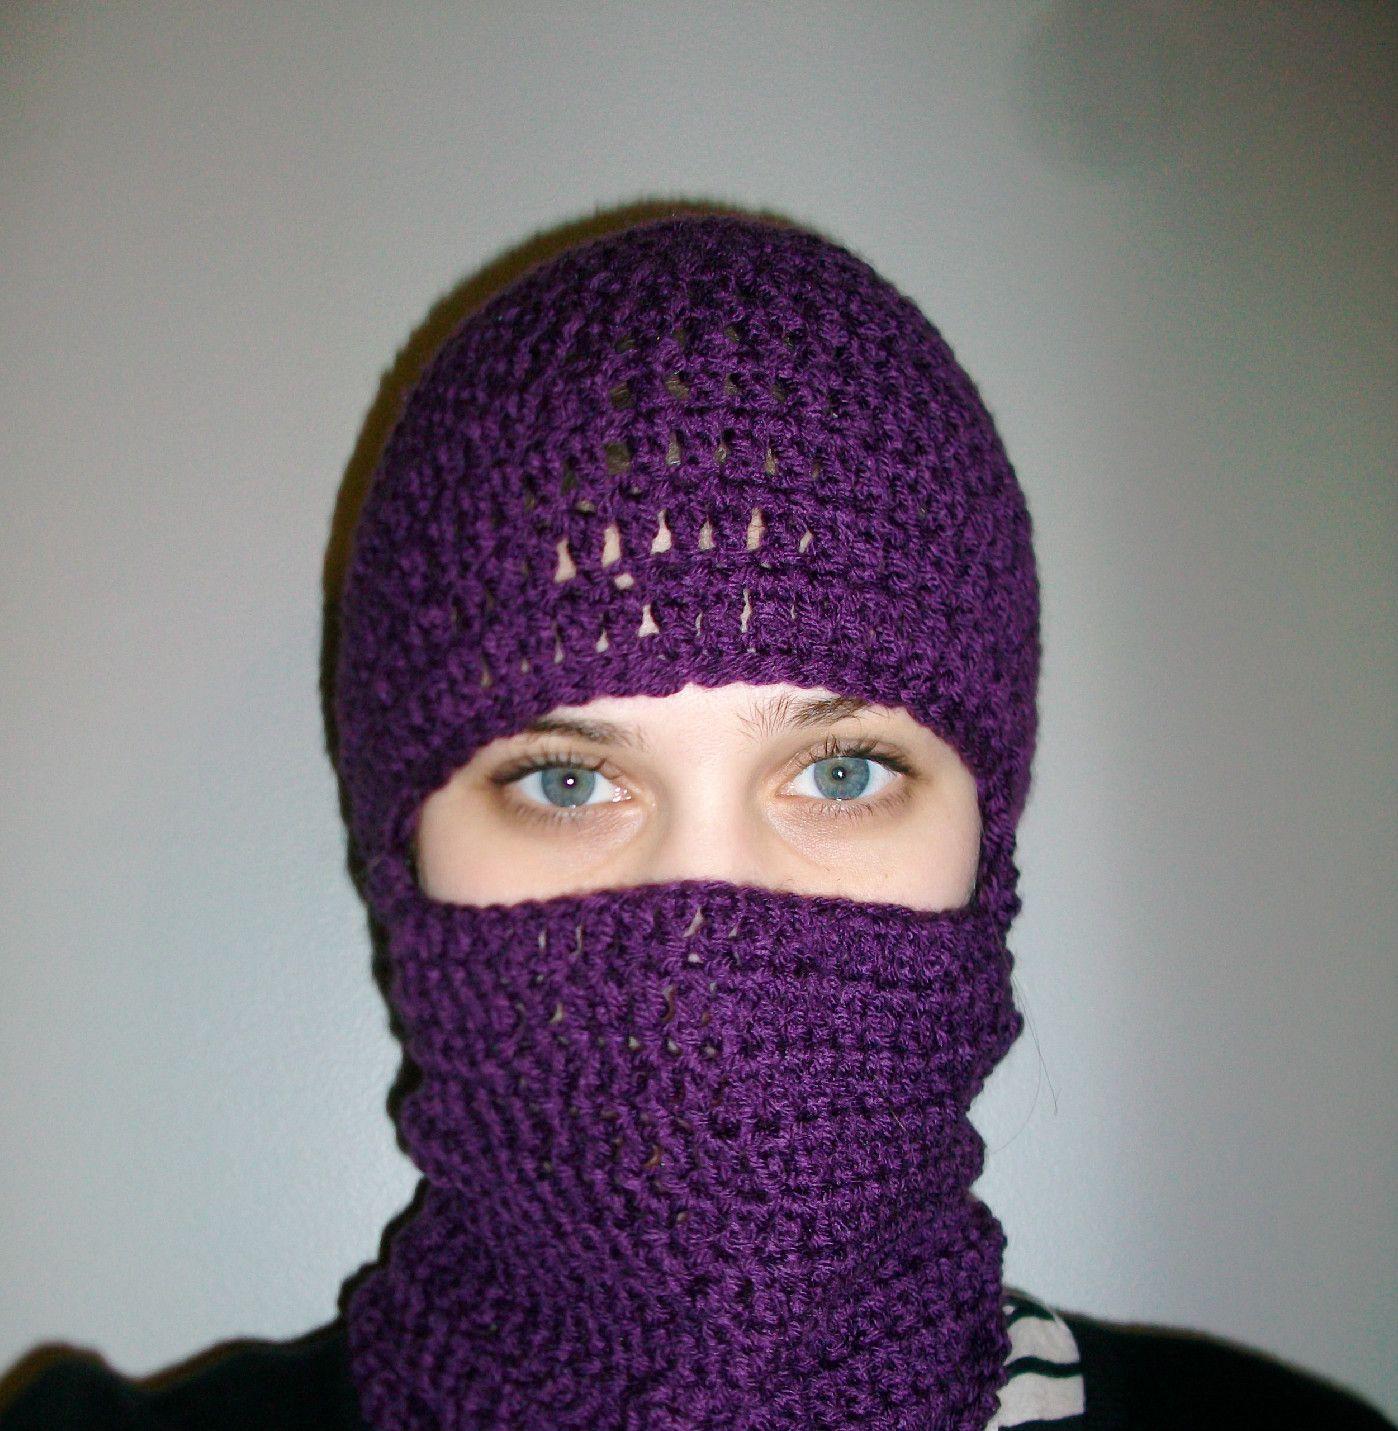 Luxury Crochet Ski Mask Pattern Free Embellishment - Easy Scarf ...